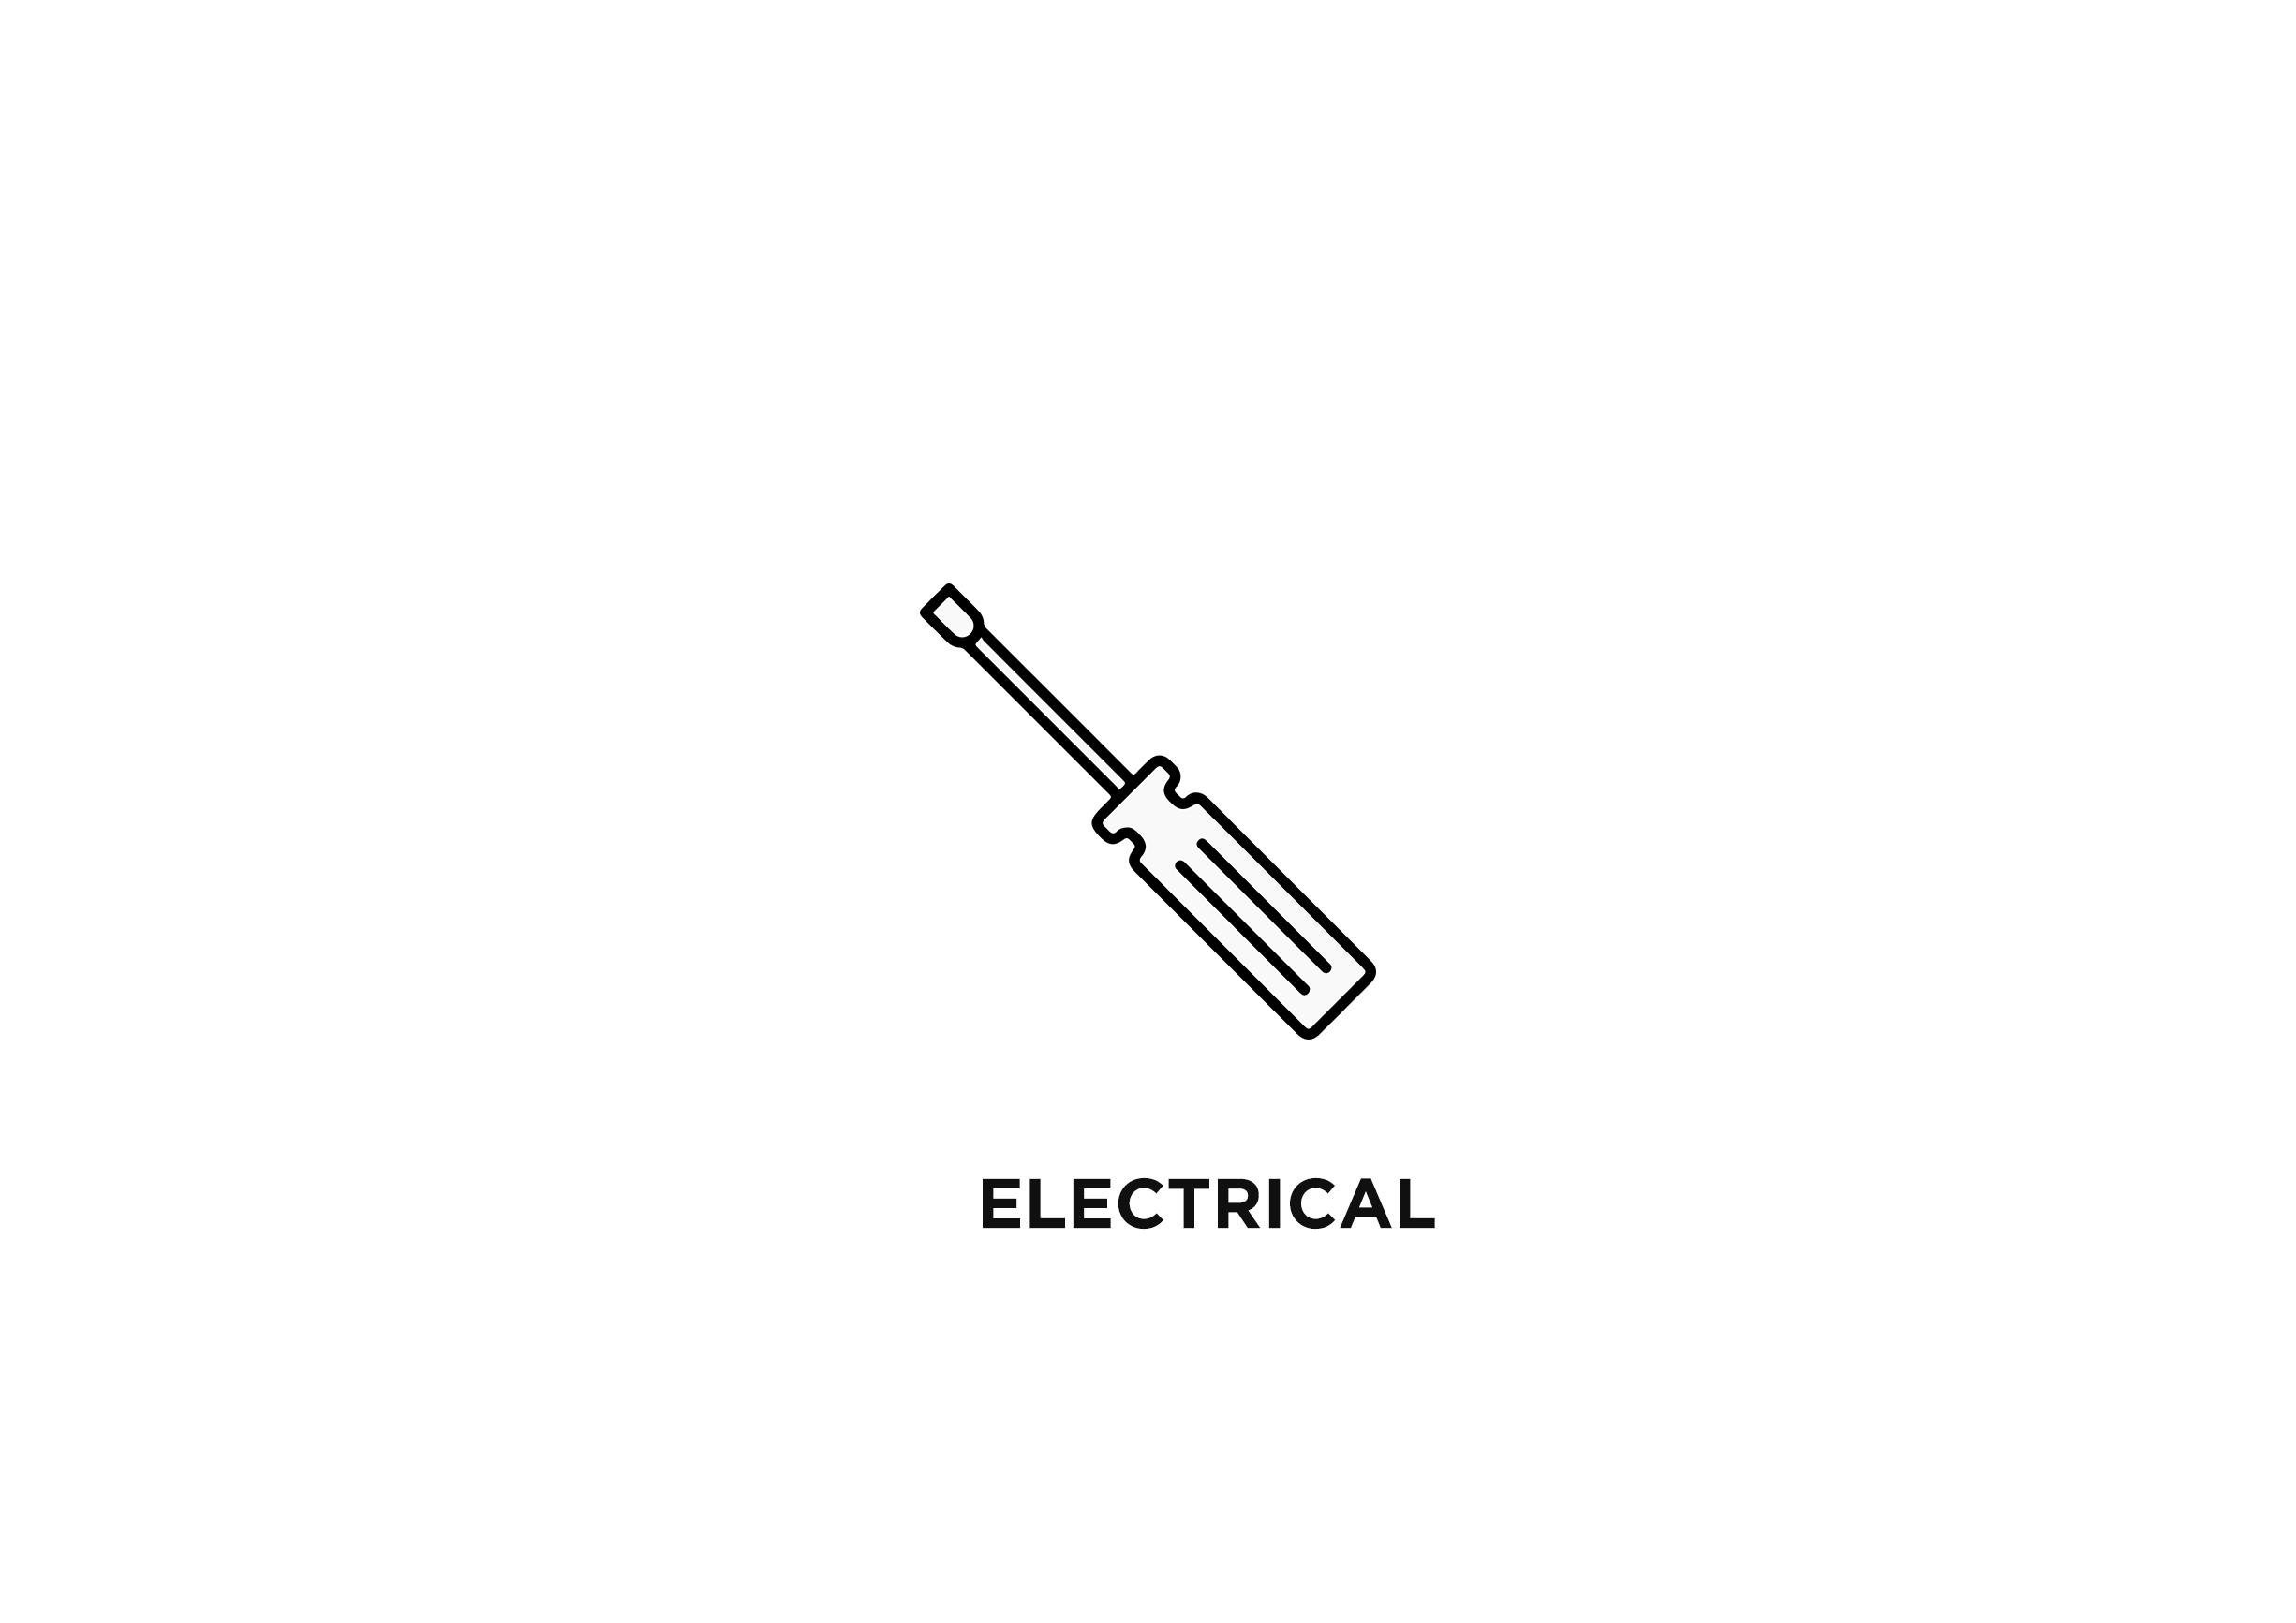 electricalforweb.jpg